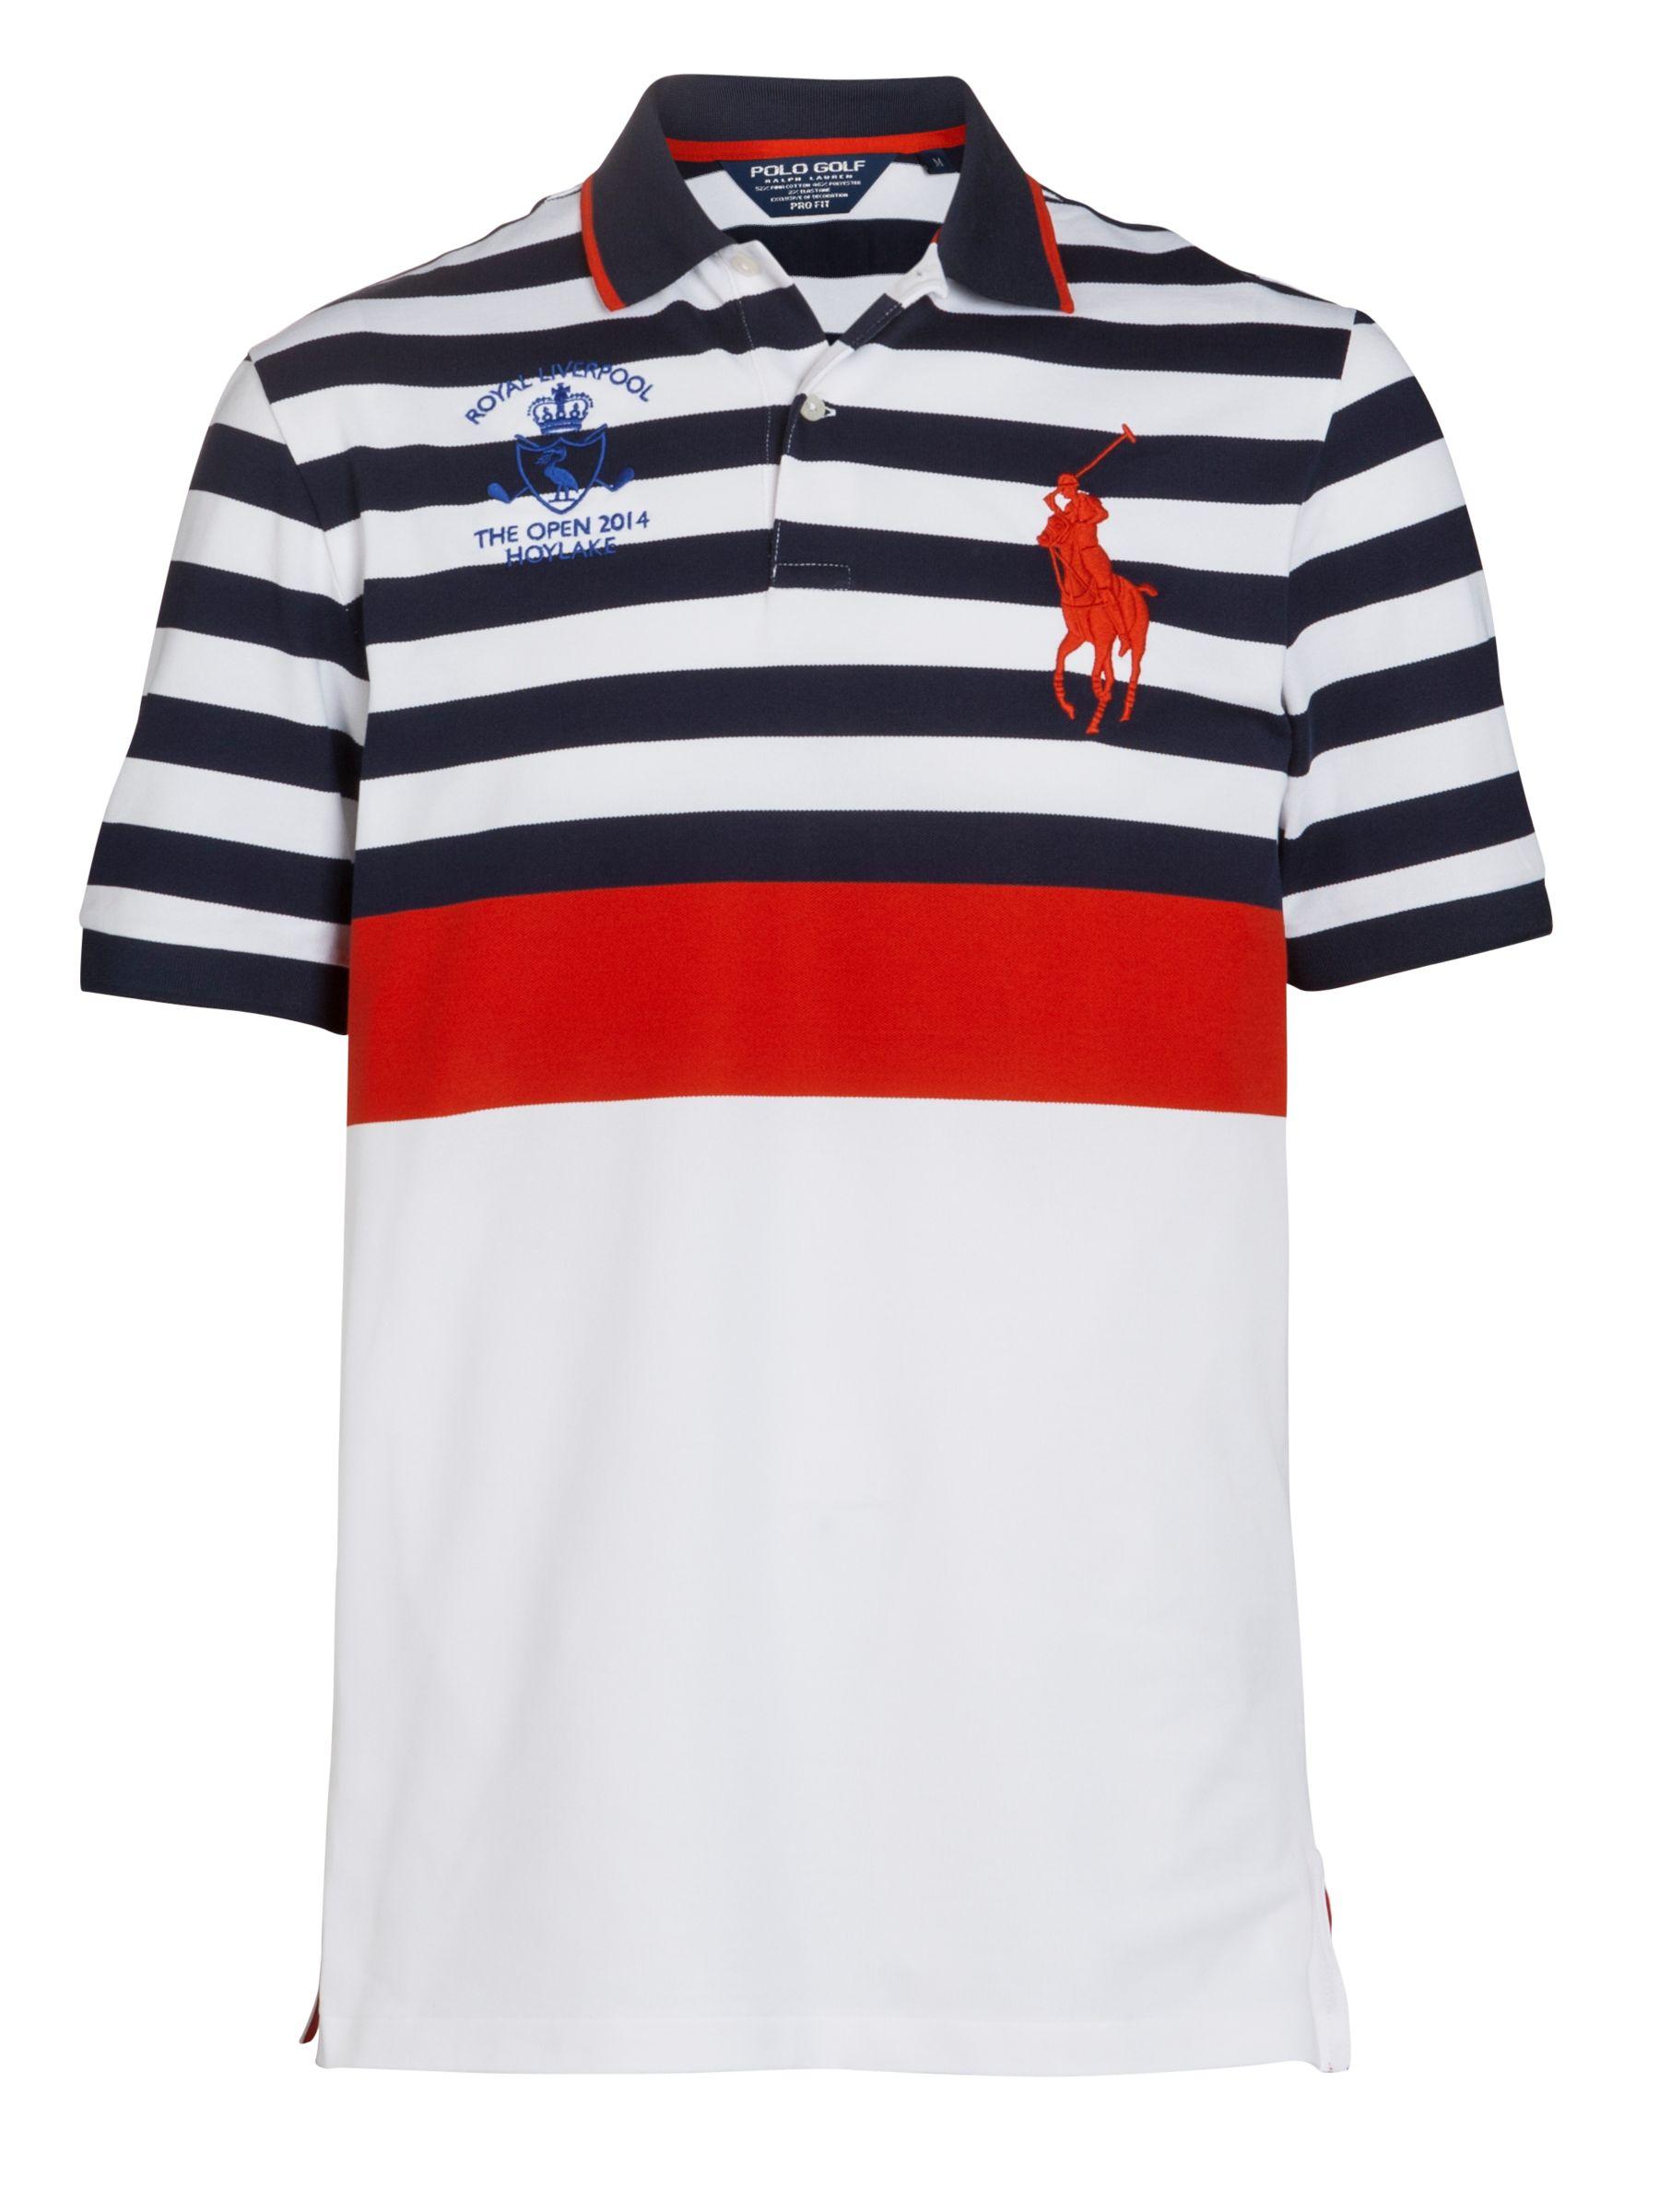 Liverpool Fc Shirt Cheap